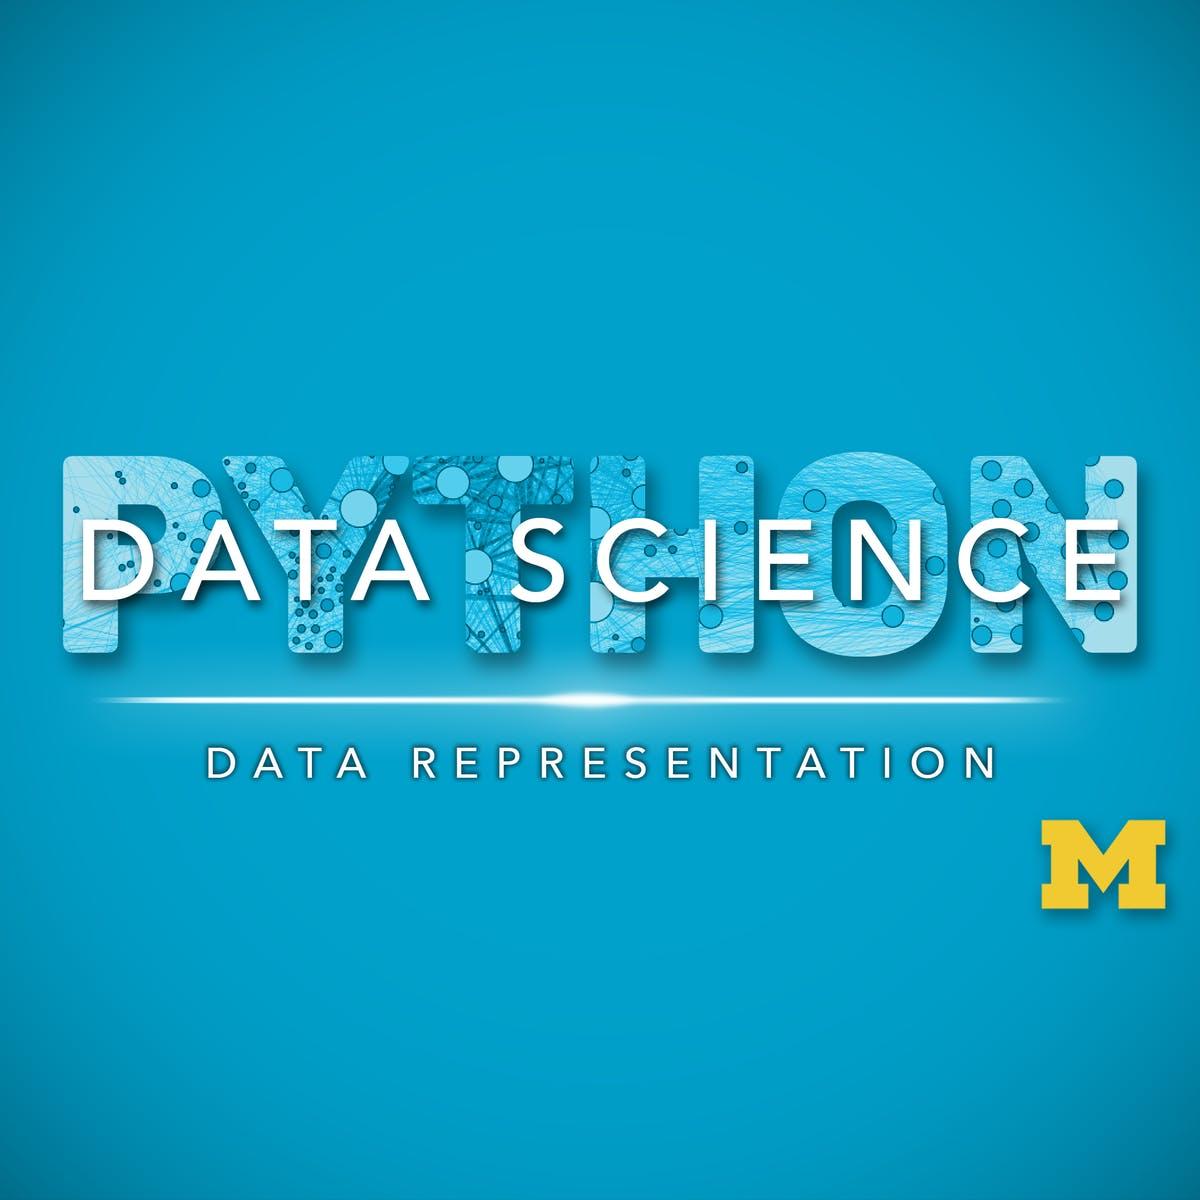 Applied Plotting, Charting & Data Representation in Python